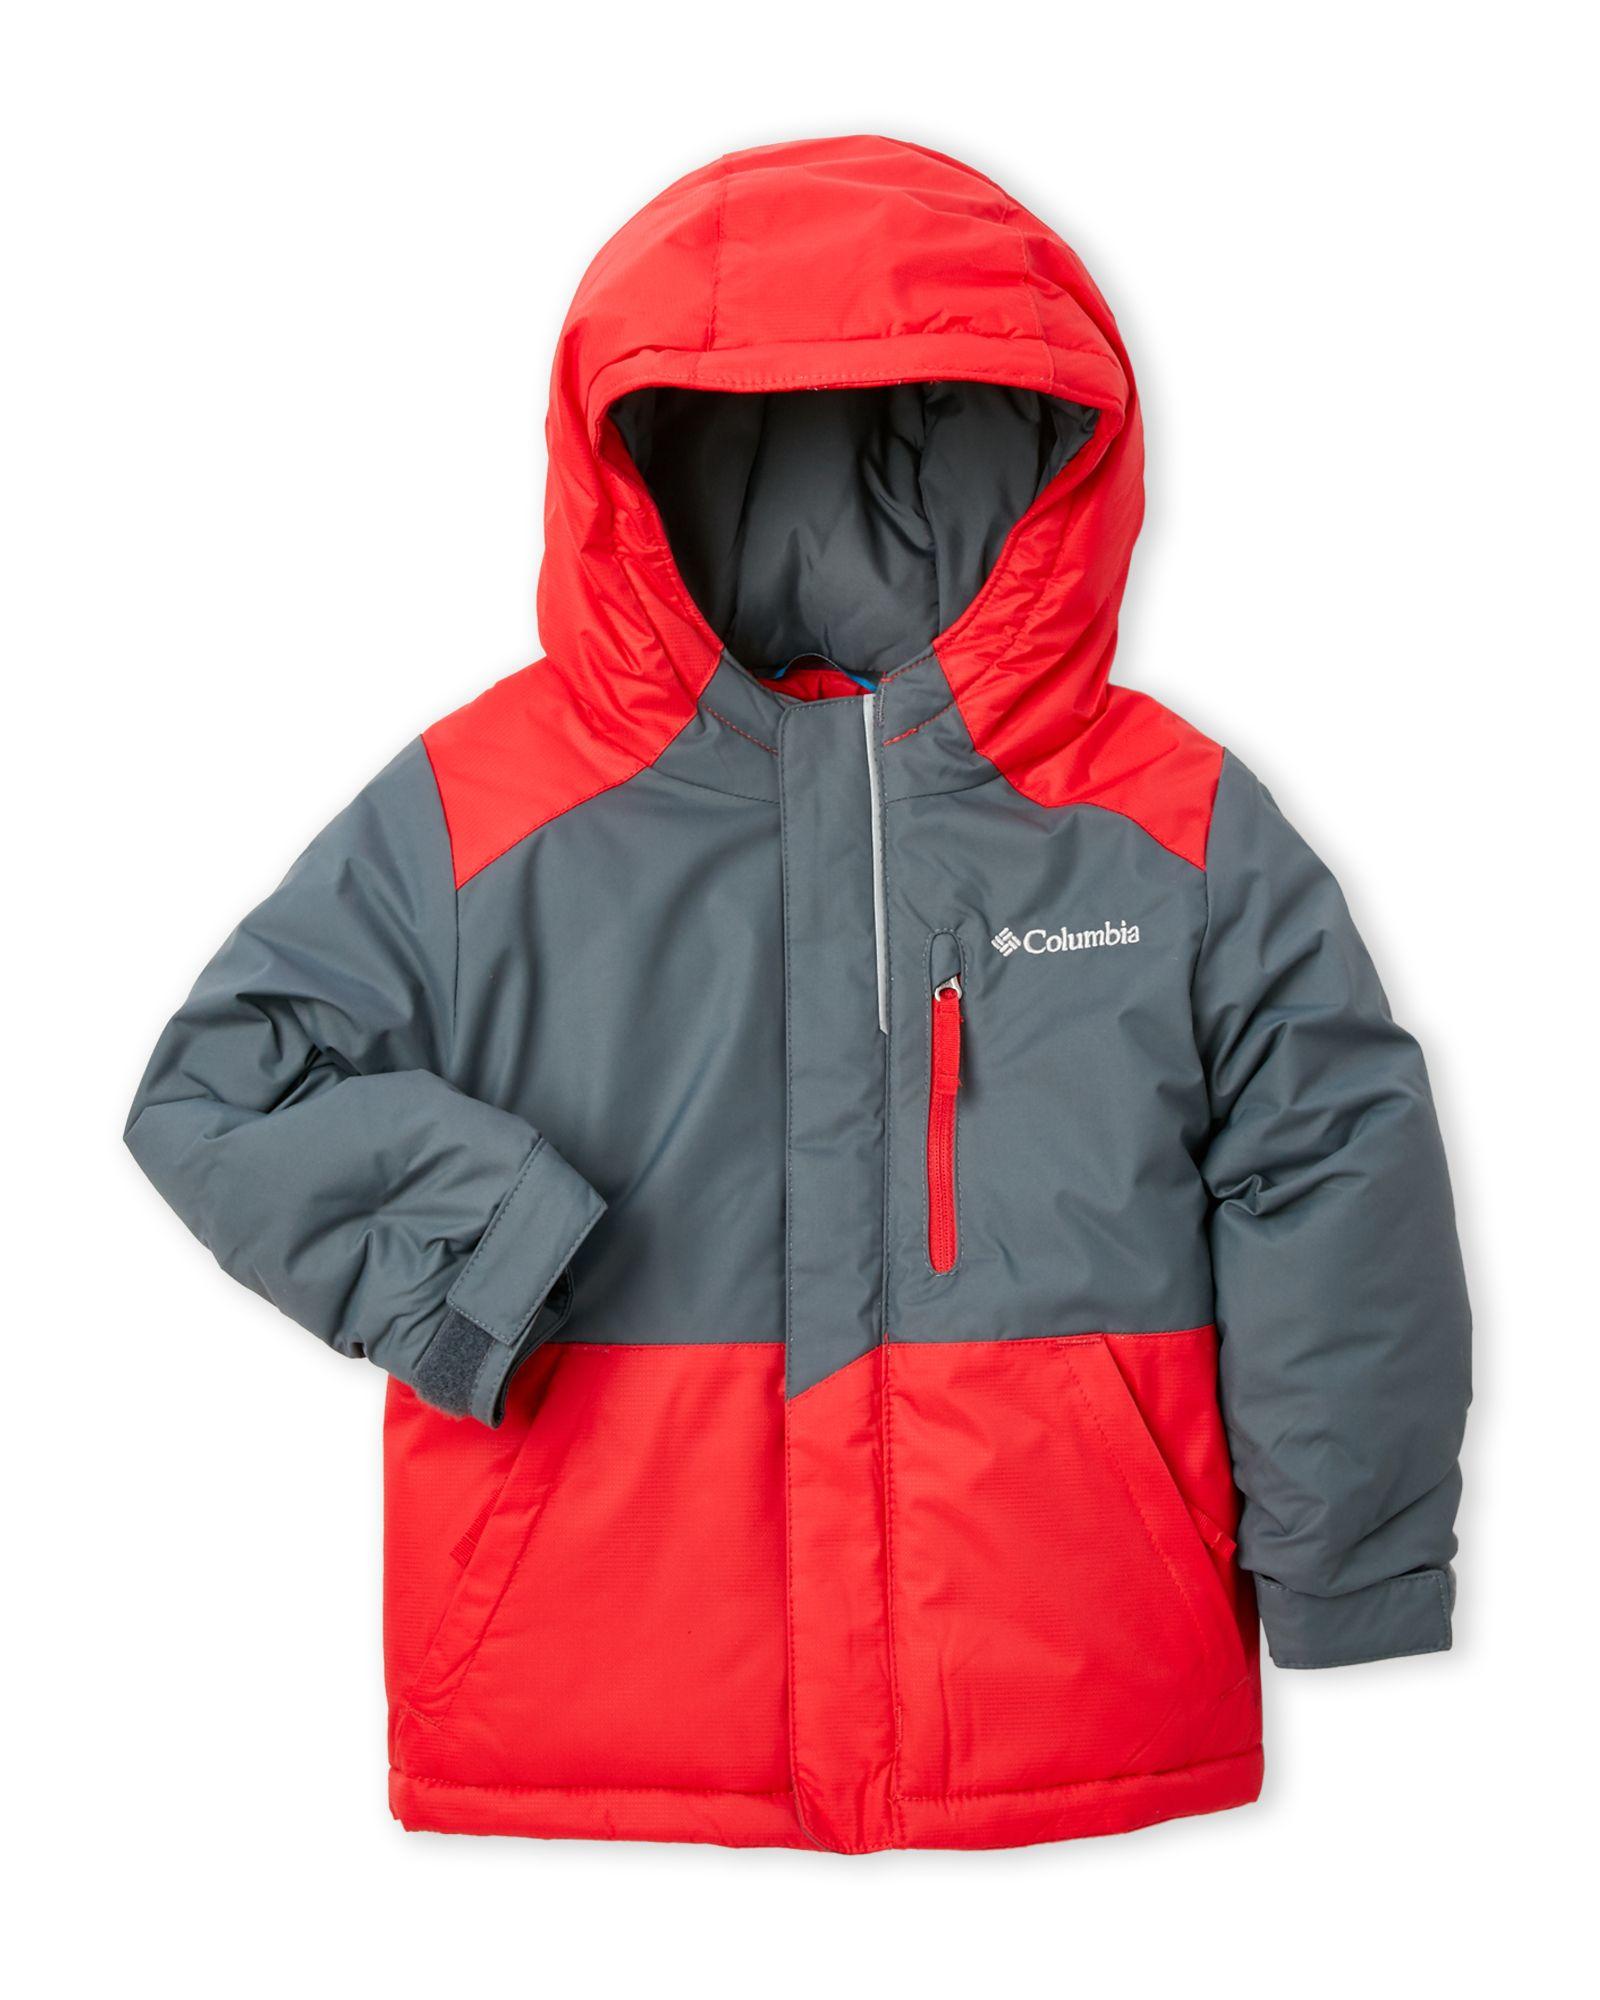 dfdc739c8 Columbia (Boys 8-20) Lightning Lift Jacket | *Apparel & Accessories*